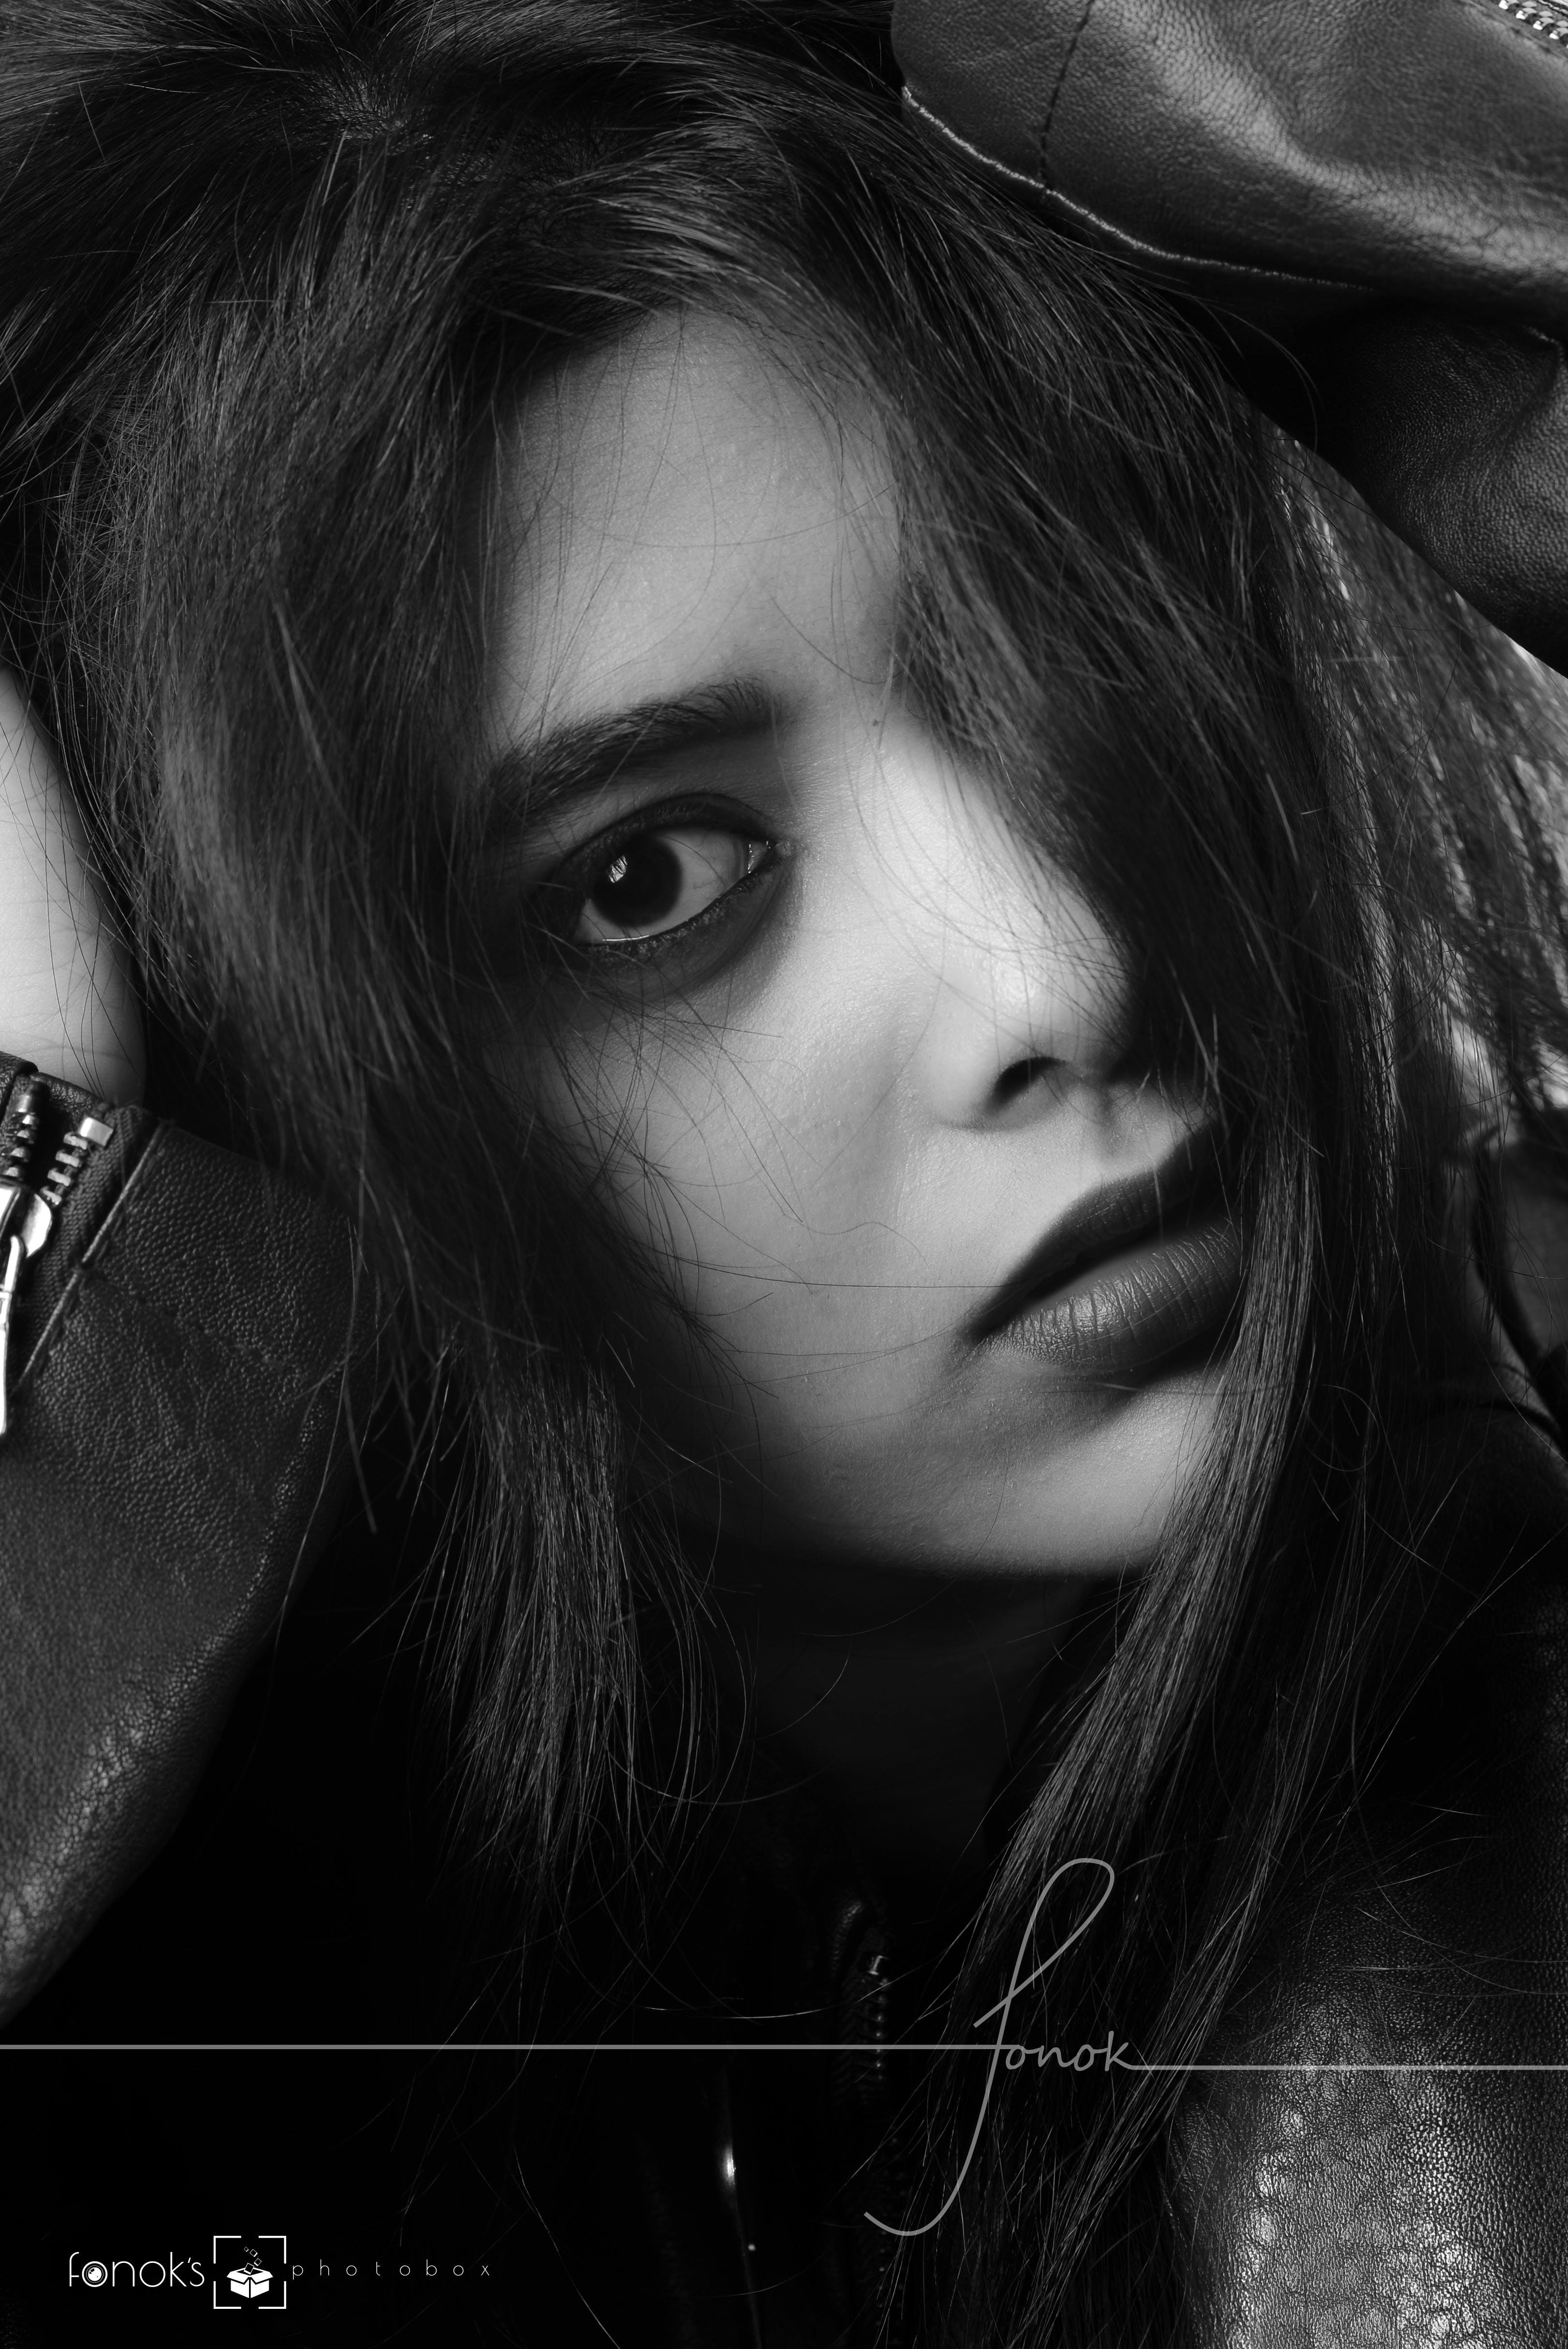 Free stock photo of #fashion, #FashionAddict, #fashionblogger, #fashiondiaries